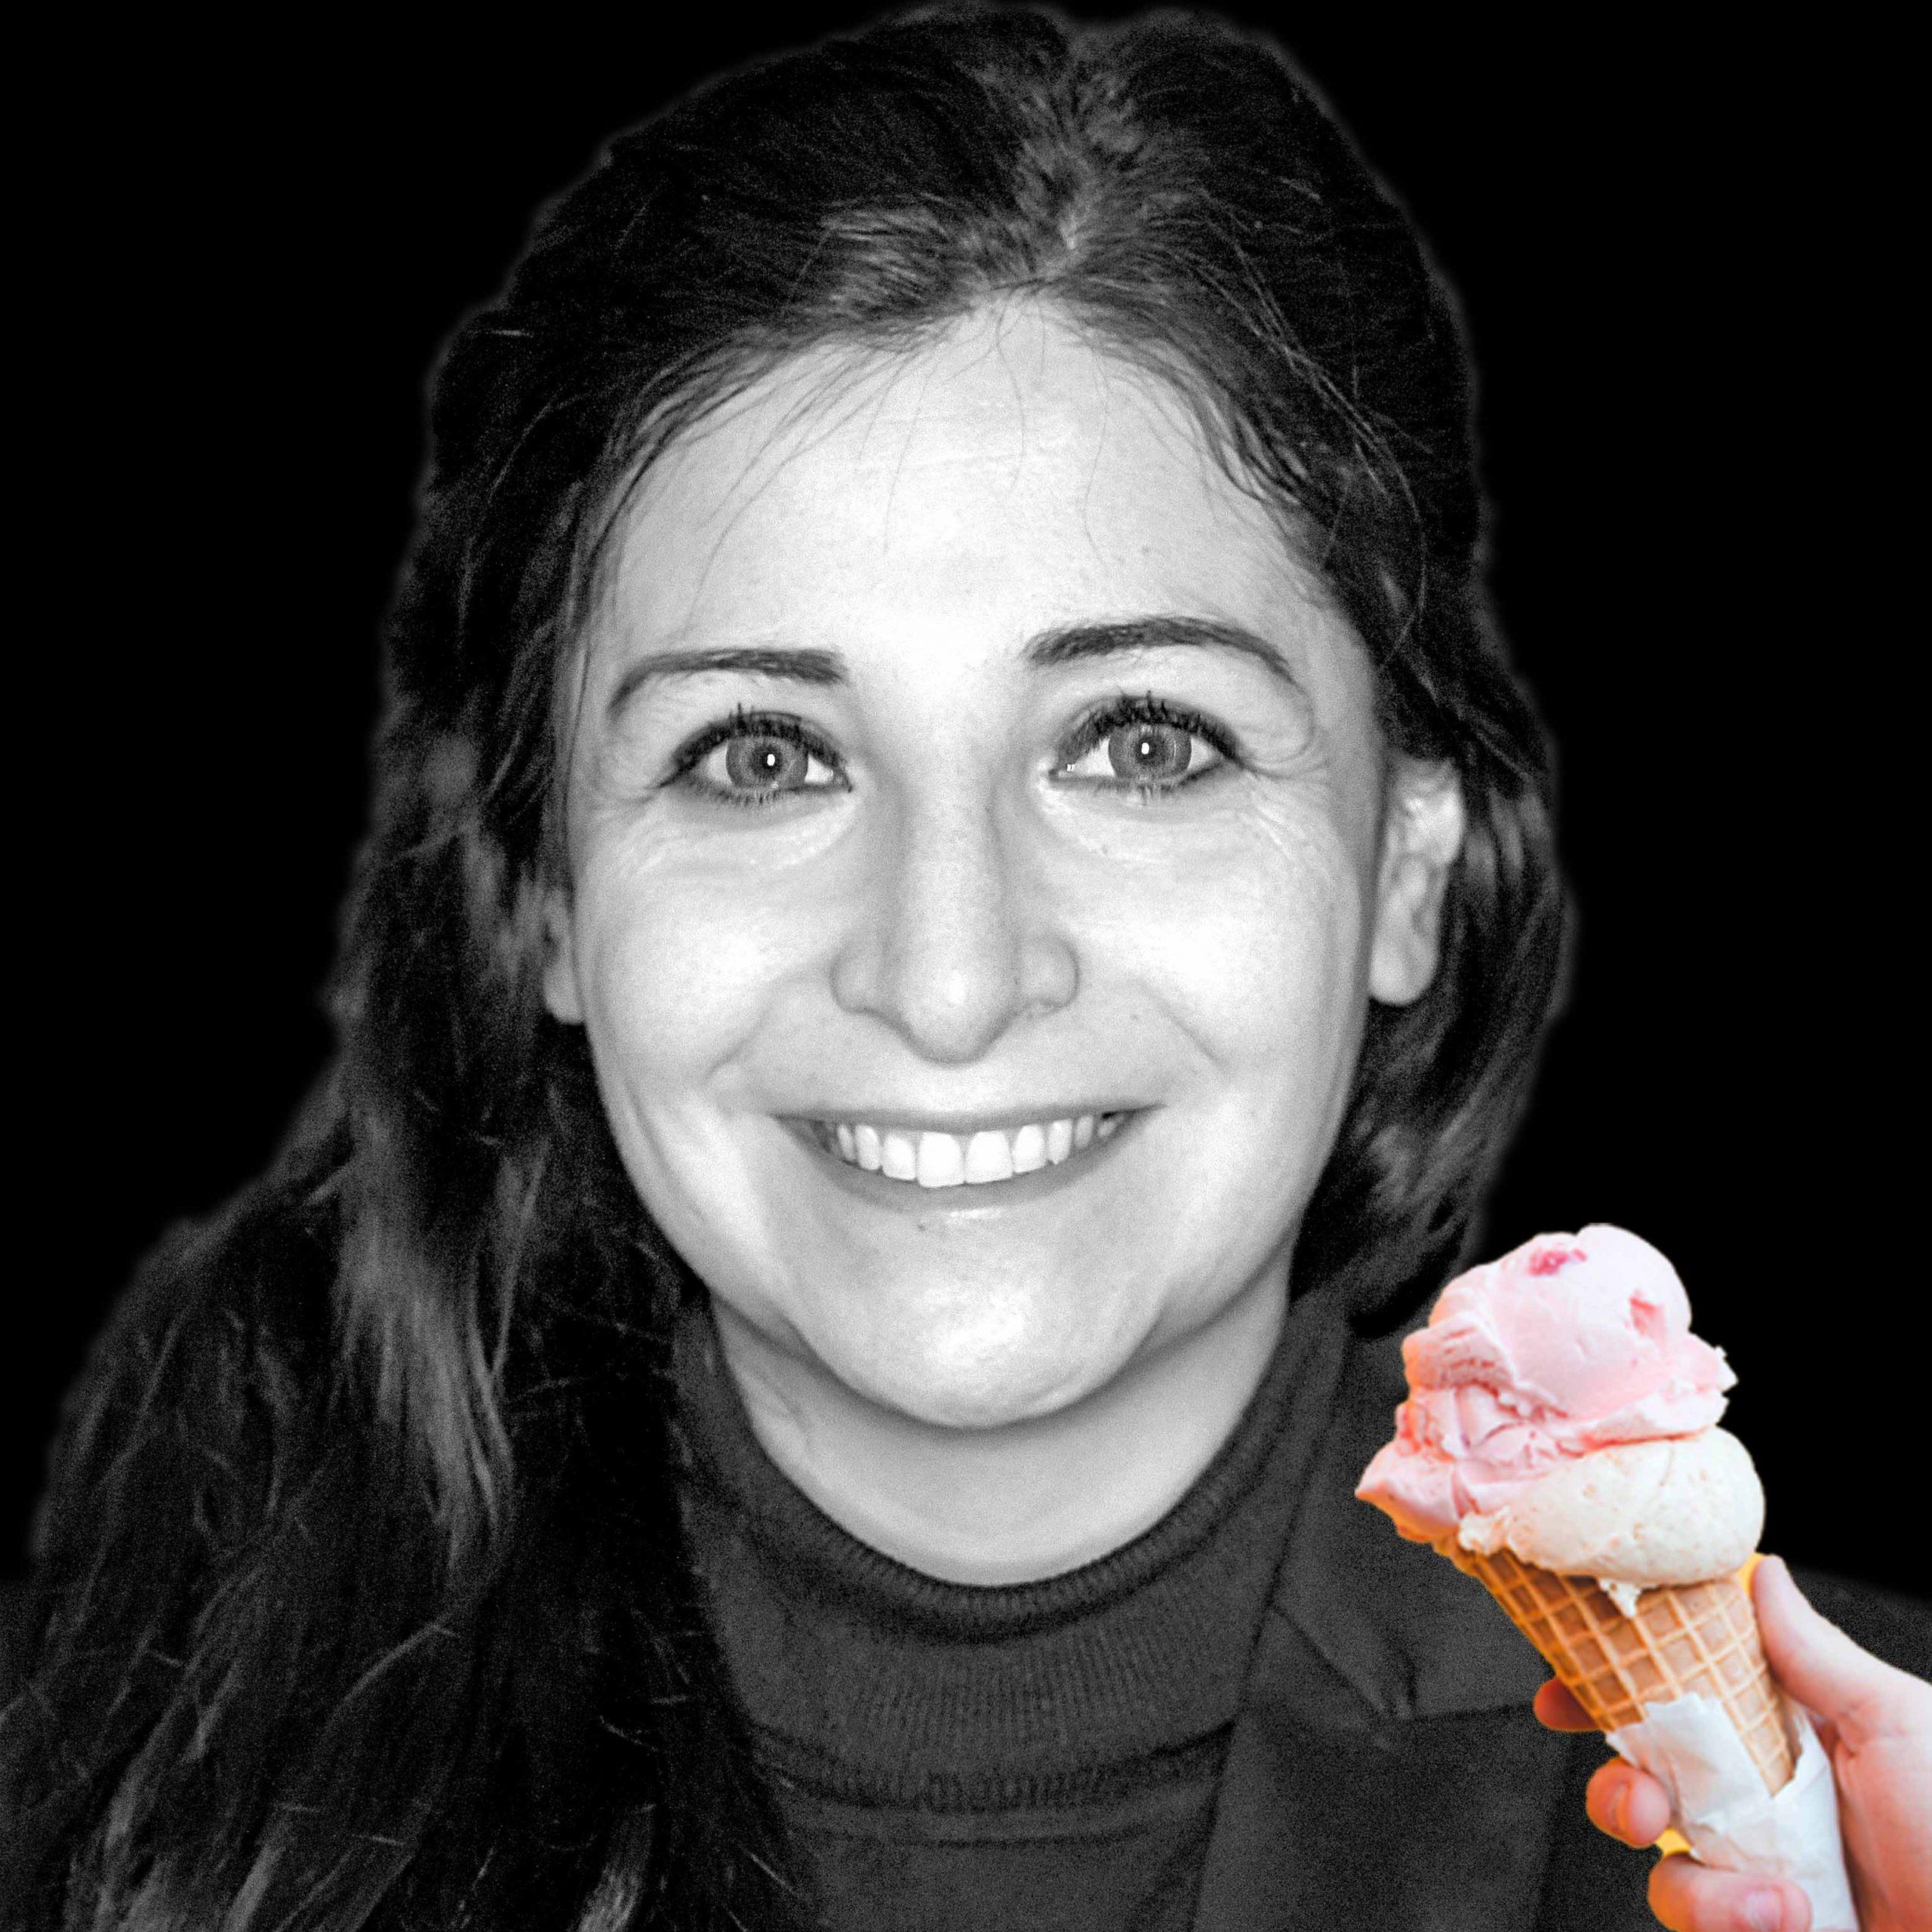 Mabel Petruzzi